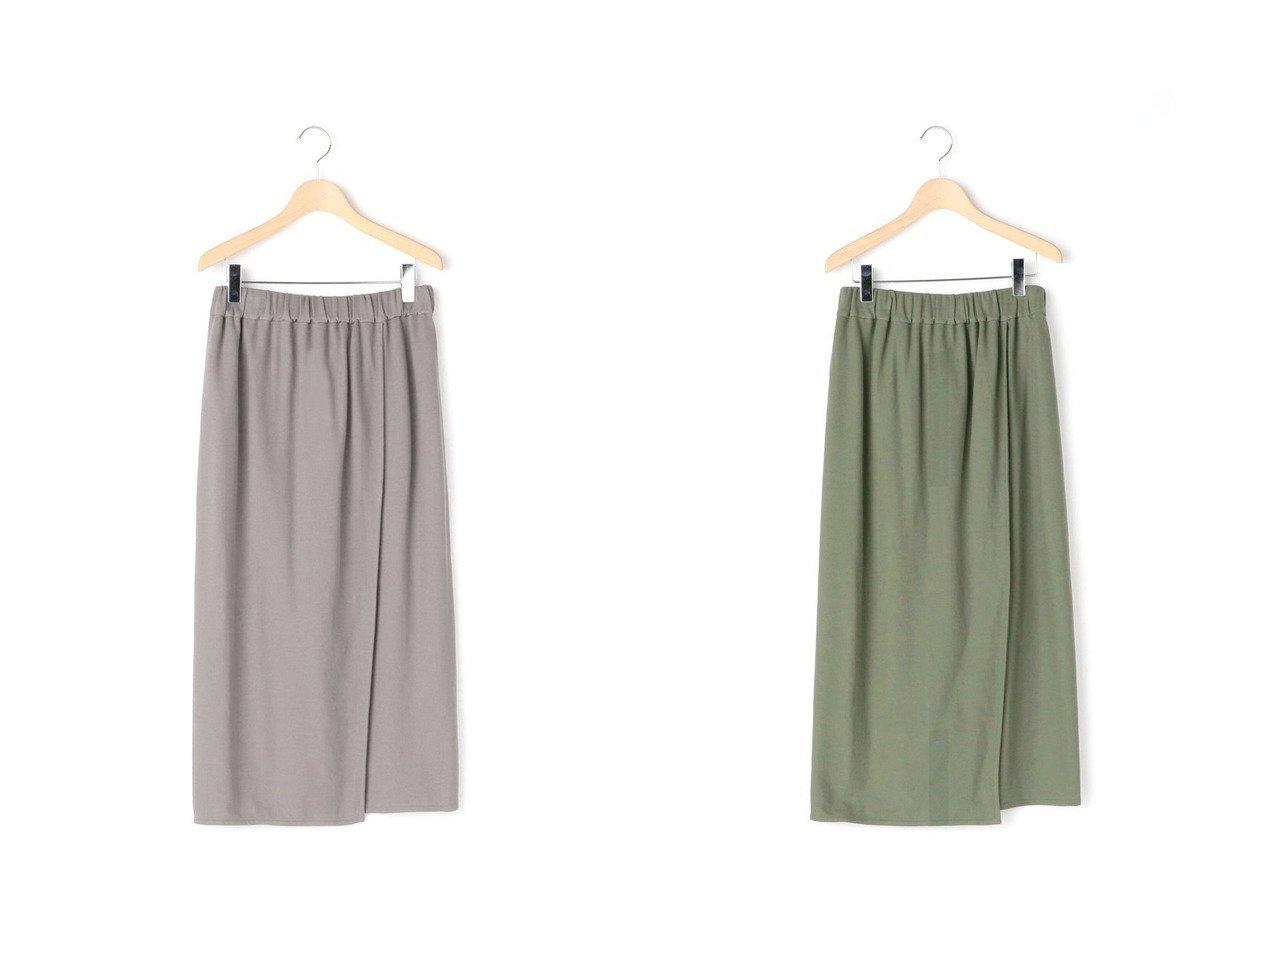 【Bshop/ビショップ】の【handvaerk】ピケラップスカート WOMEN 【スカート】おすすめ!人気、トレンド・レディースファッションの通販 おすすめで人気の流行・トレンド、ファッションの通販商品 インテリア・家具・メンズファッション・キッズファッション・レディースファッション・服の通販 founy(ファニー) https://founy.com/ ファッション Fashion レディースファッション WOMEN スカート Skirt ロングスカート Long Skirt S/S・春夏 SS・Spring/Summer ラップ ロング 春 Spring |ID:crp329100000040826